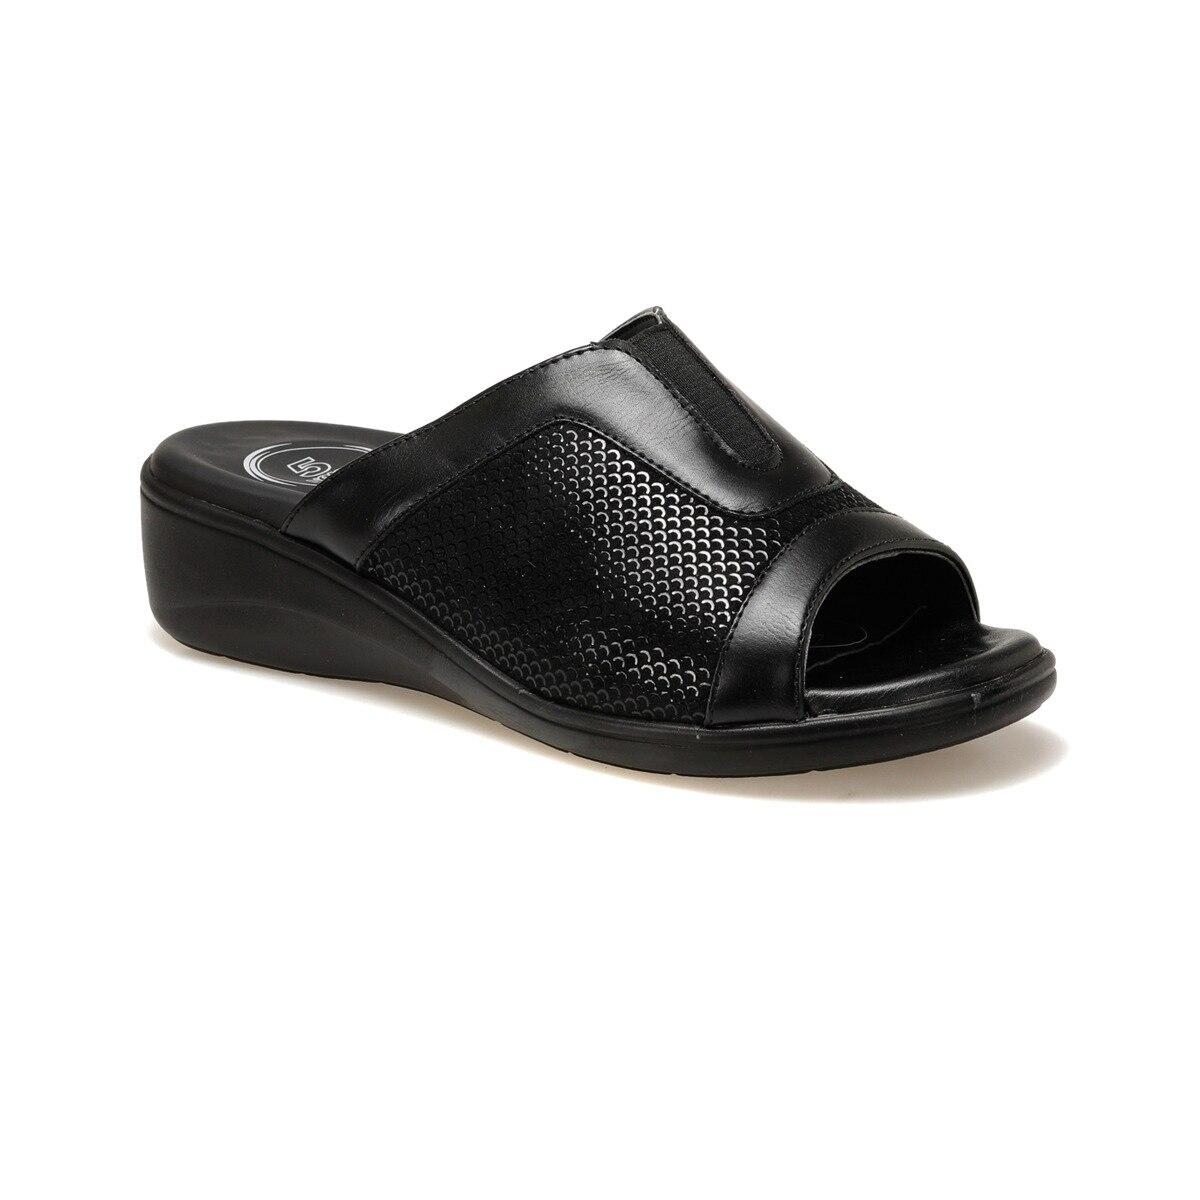 FLO 92.4M0003.Z Black Female Slippers Polaris 5 Point